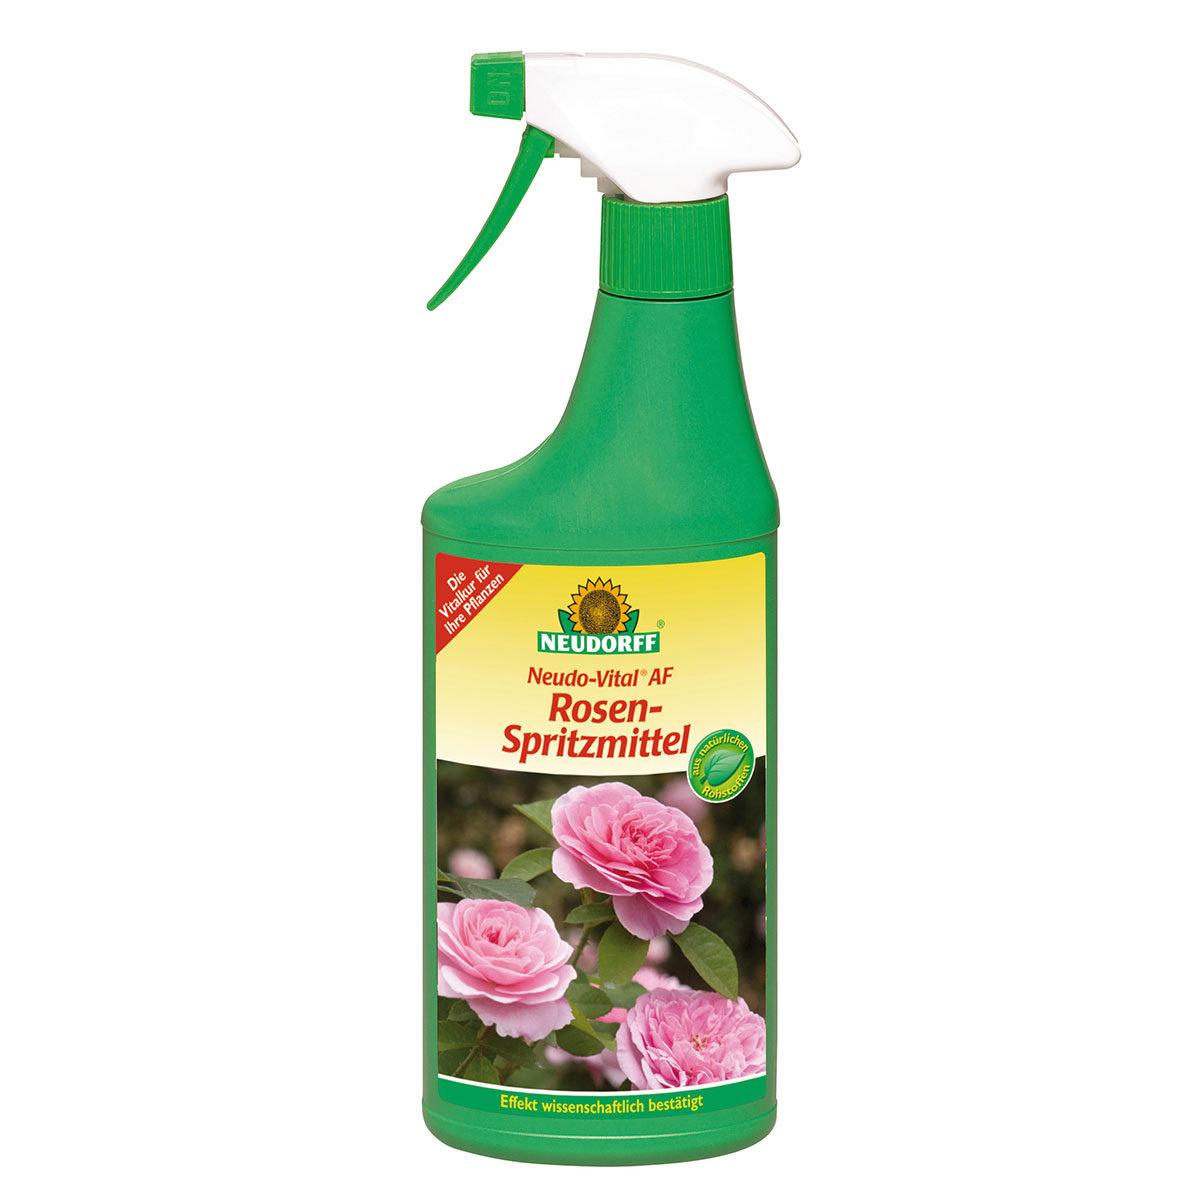 Neudo-Vital® AF Rosen-Spritzmittel, 500 ml